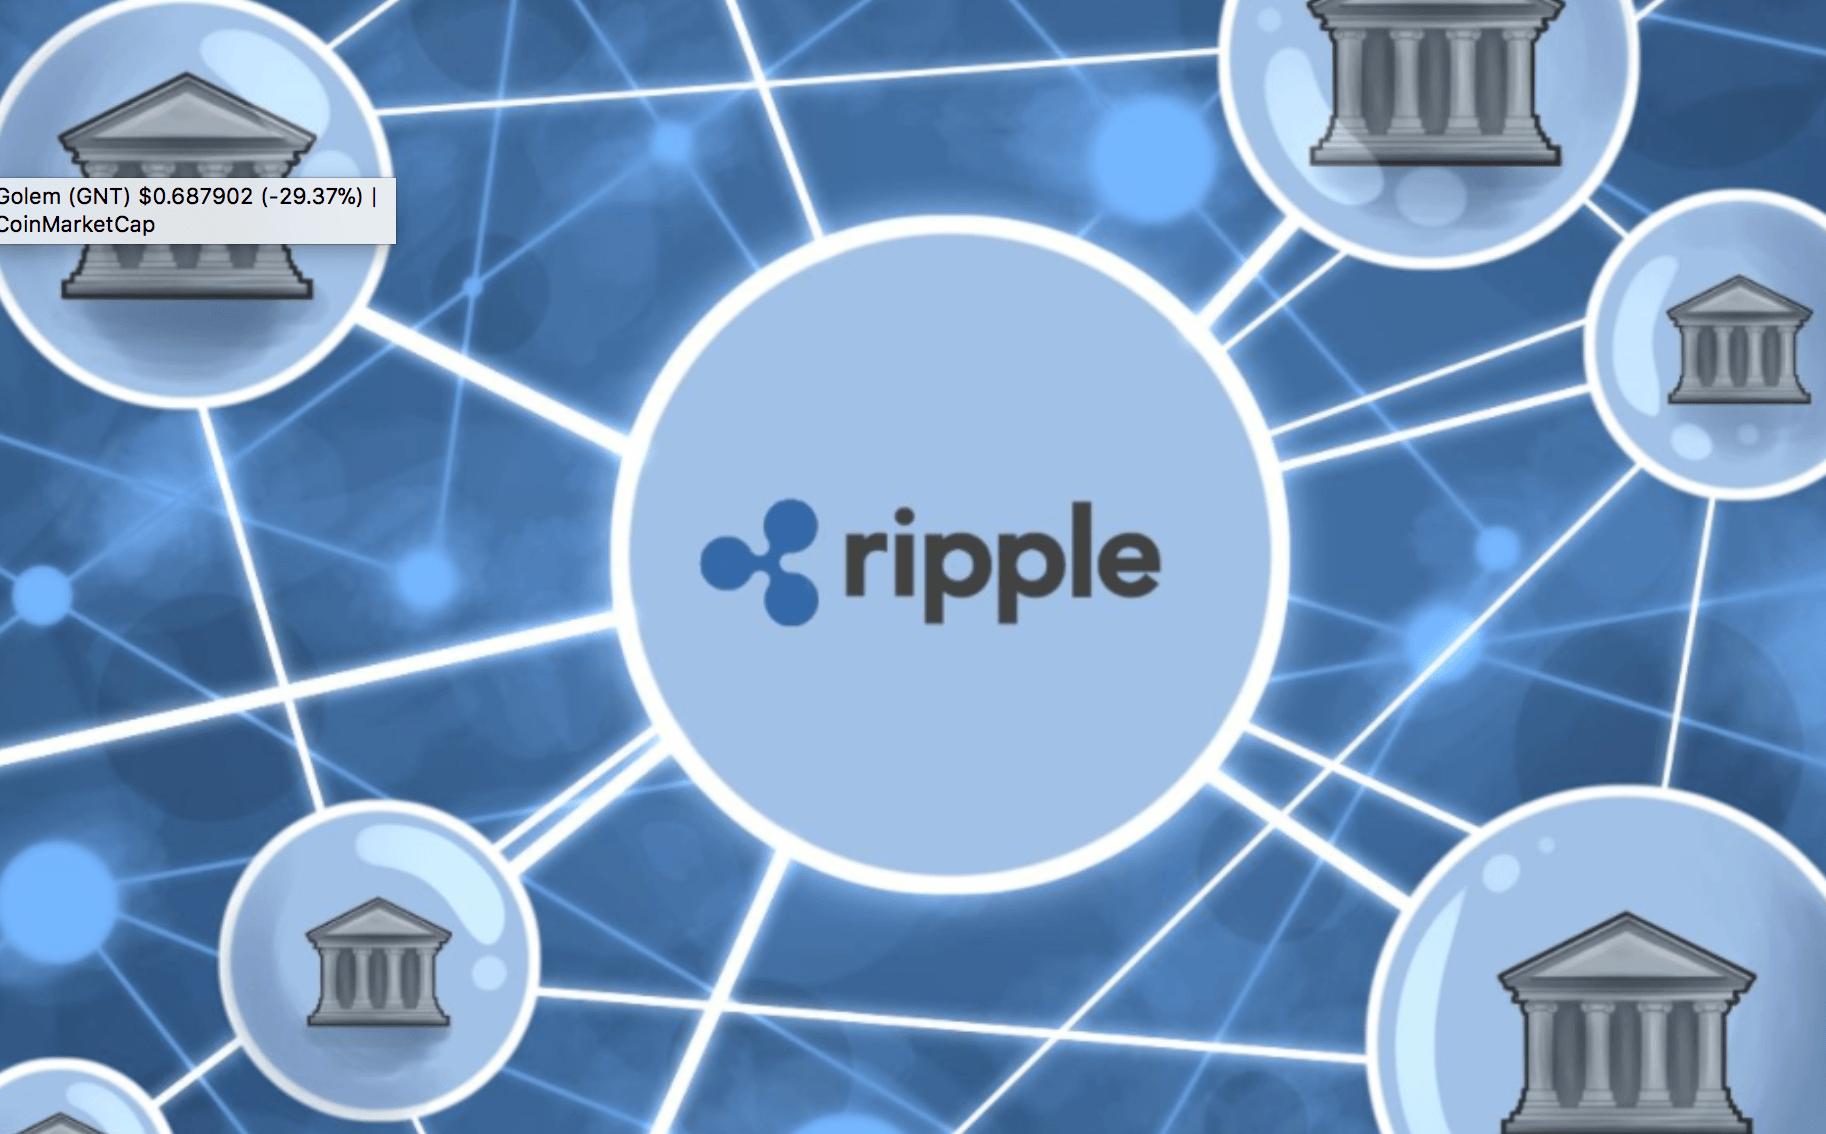 ripple criptovaluta